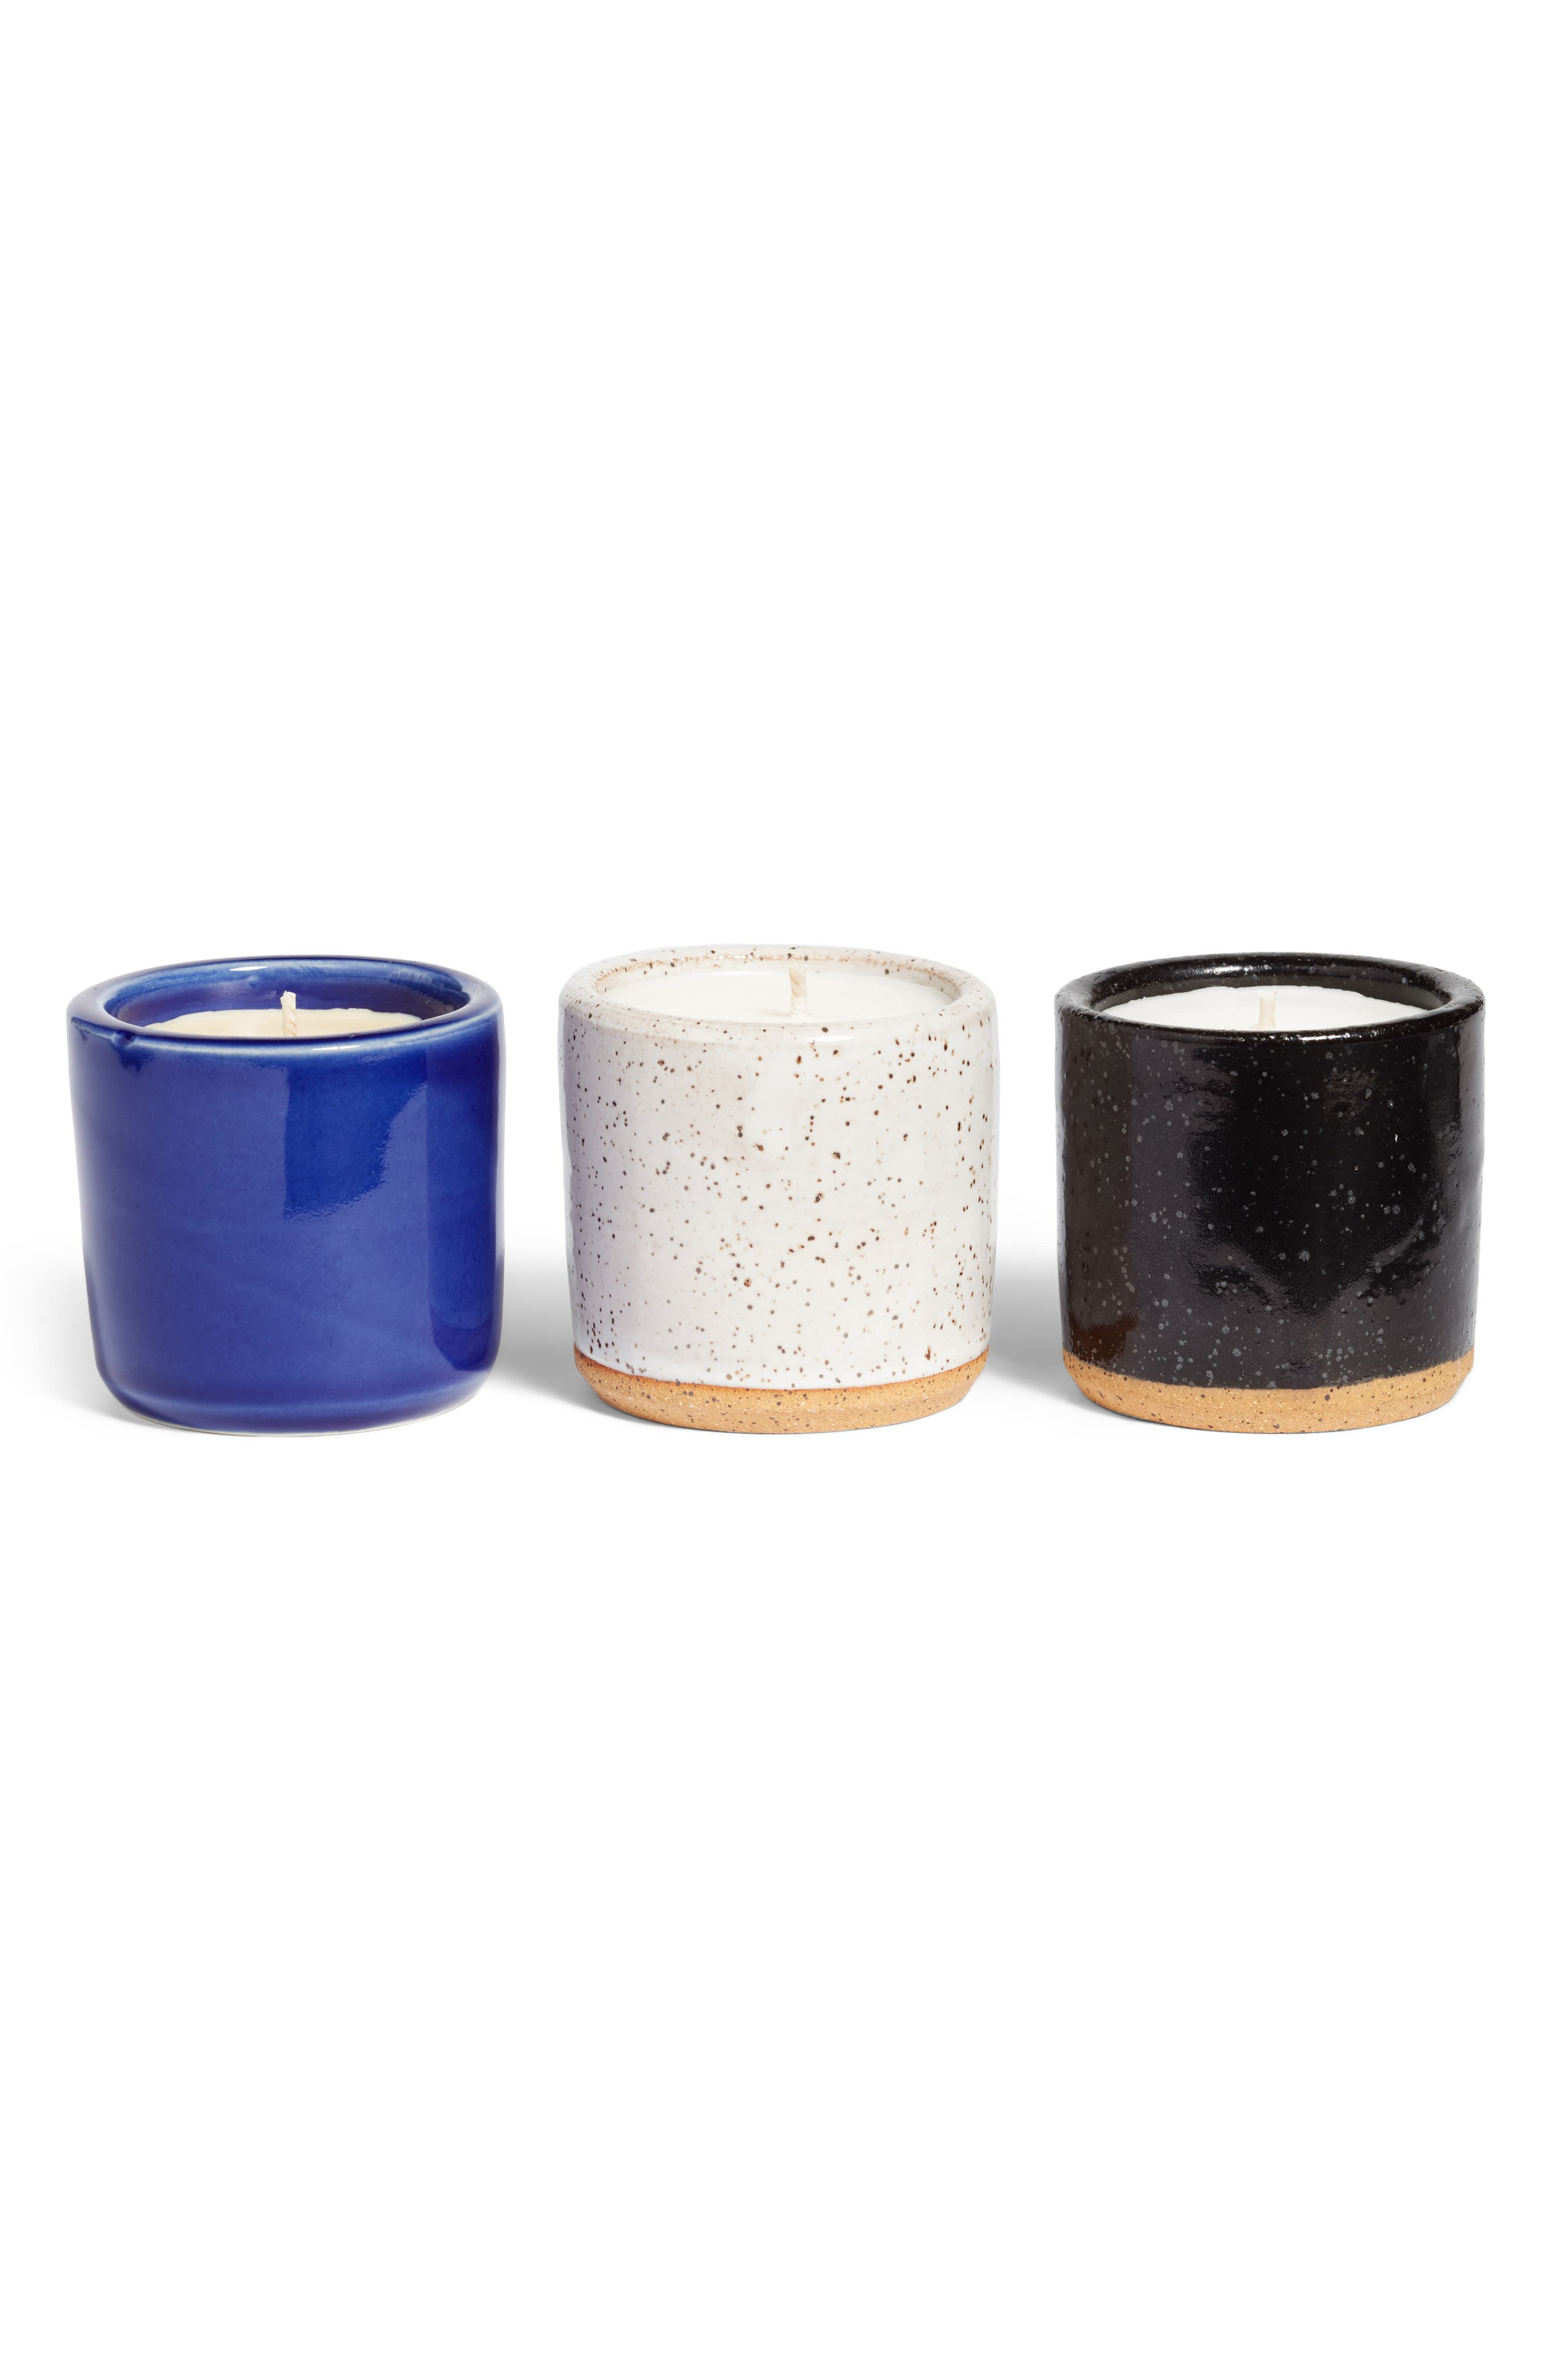 Set of 3 Ceramic Scented Candles,                             Main thumbnail 1, color,                             Blk/ Wht Speckle/ Cobalt Blue